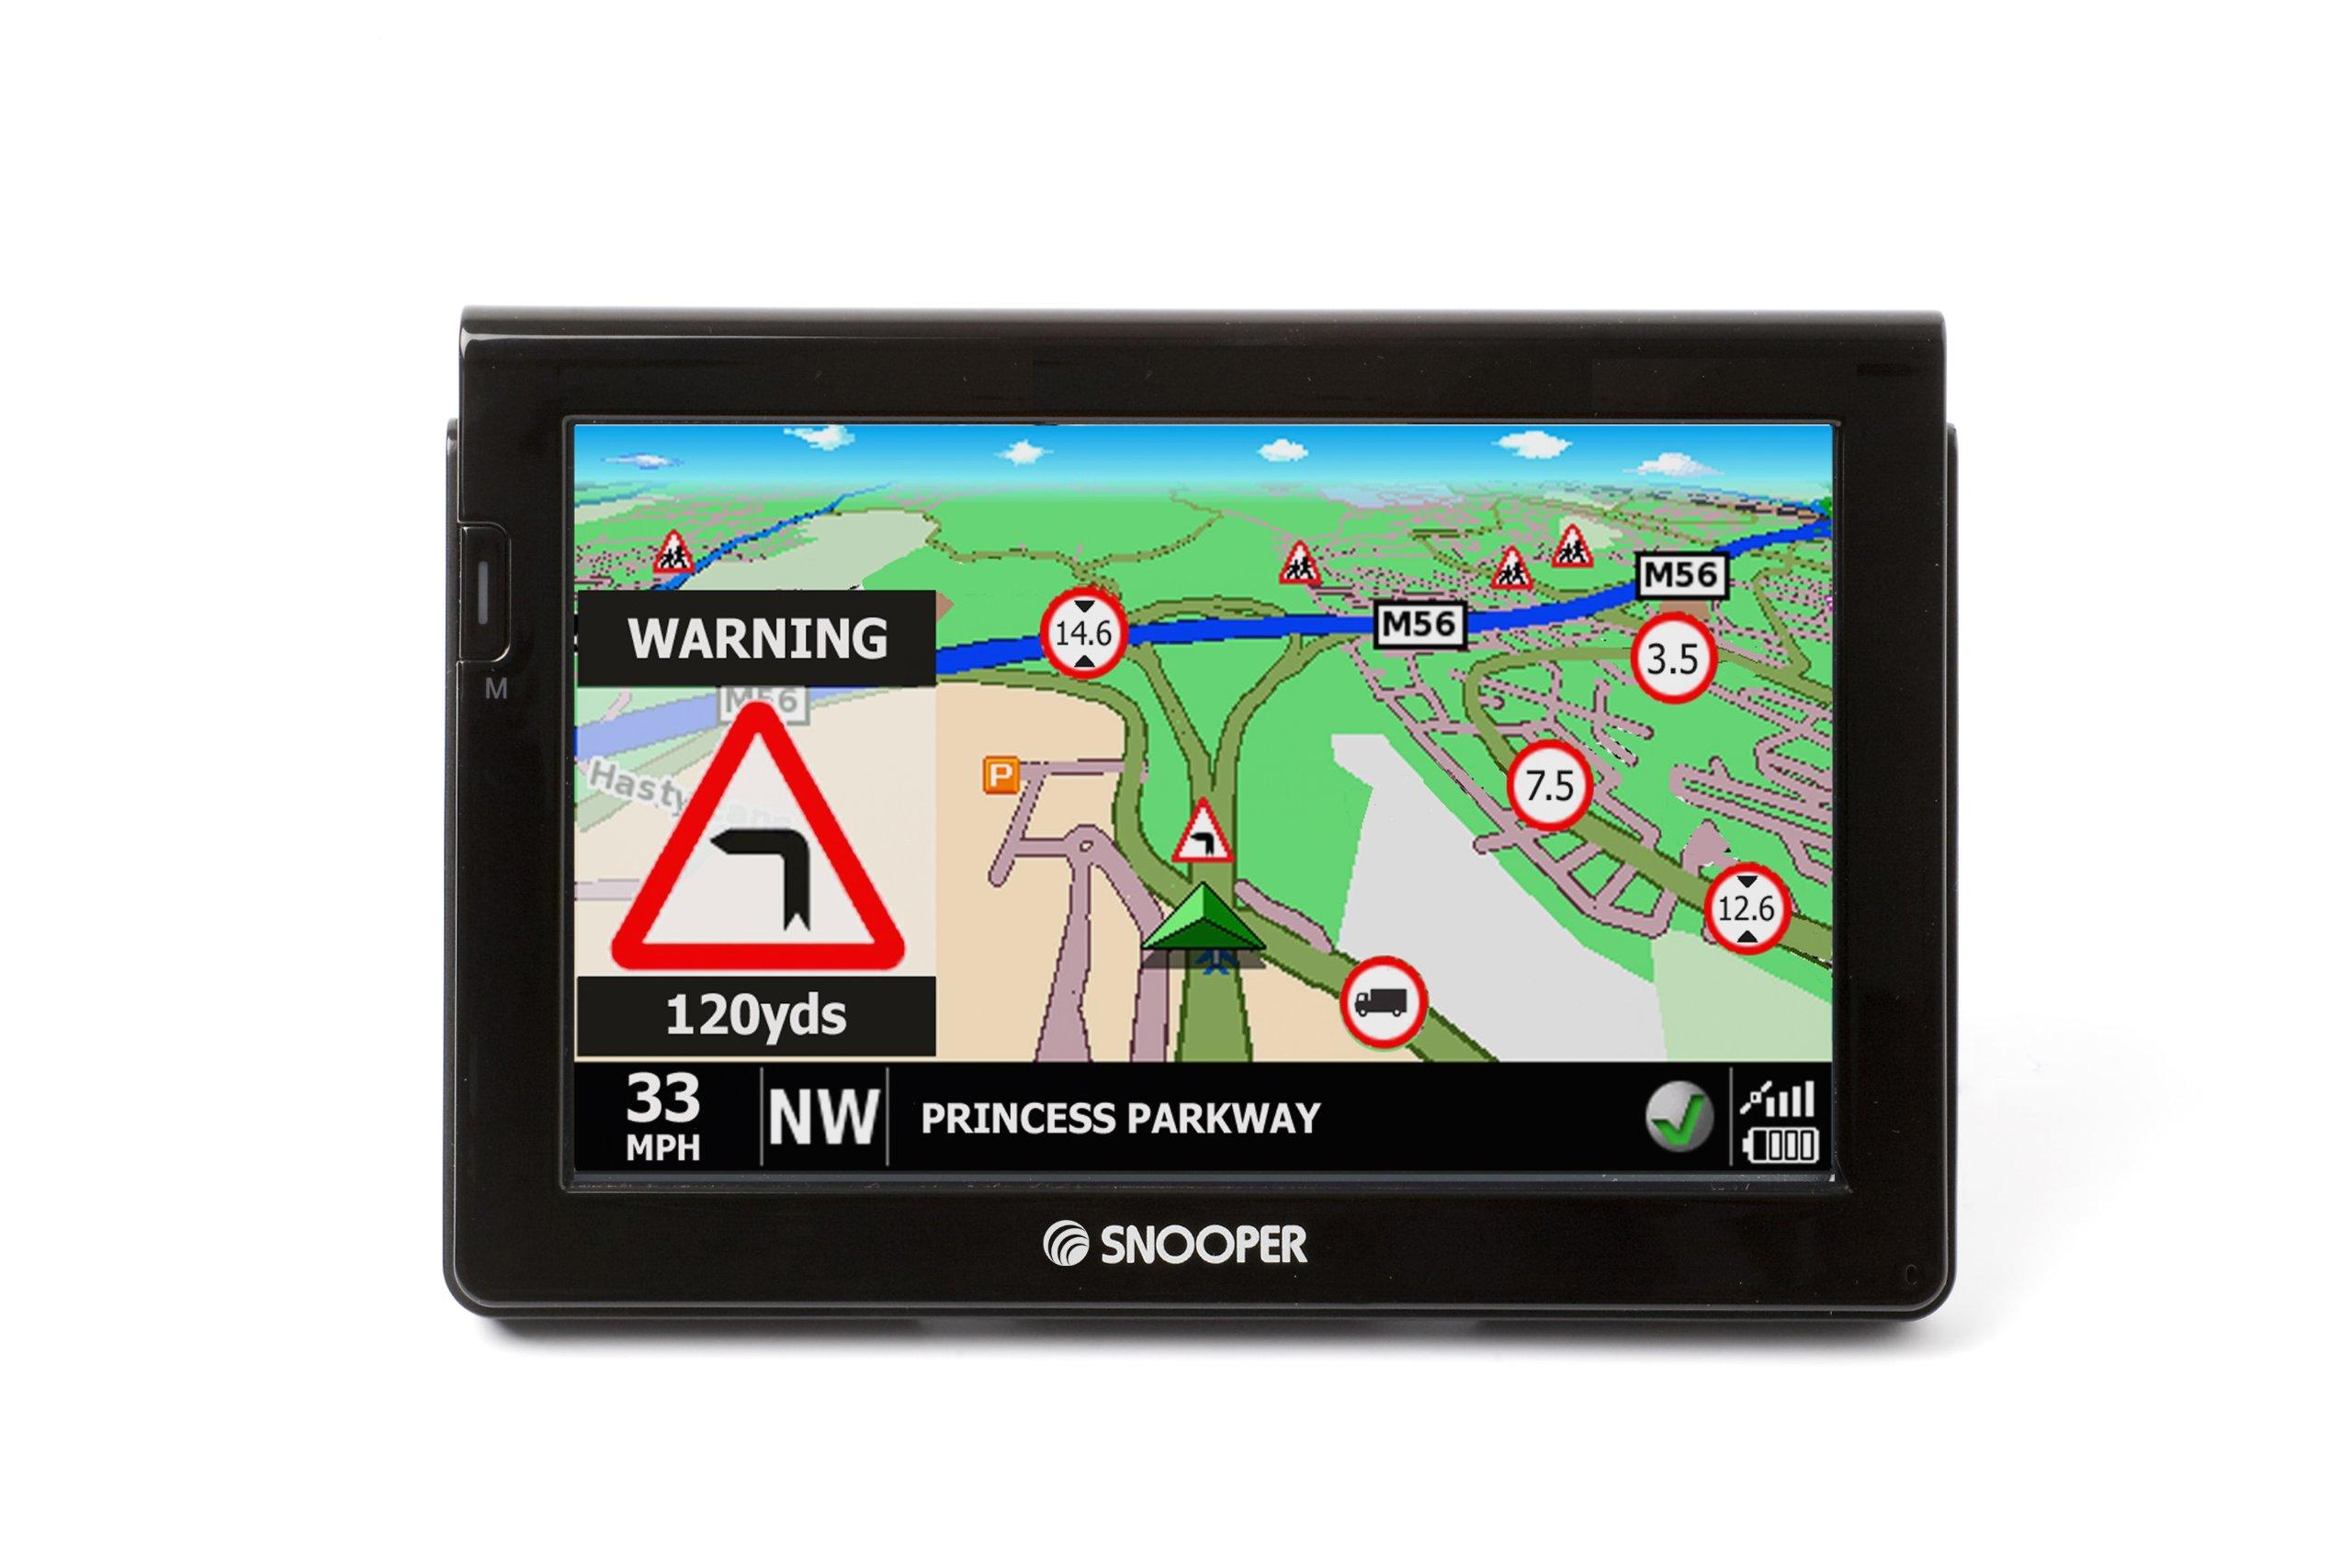 Snooper-S7000-Truckmate-LKW-Navigationssystem-178-cm-7-Zoll-Touchscreen-Display-TMC-Pro-DVB-T-SD-Karte-USB-20